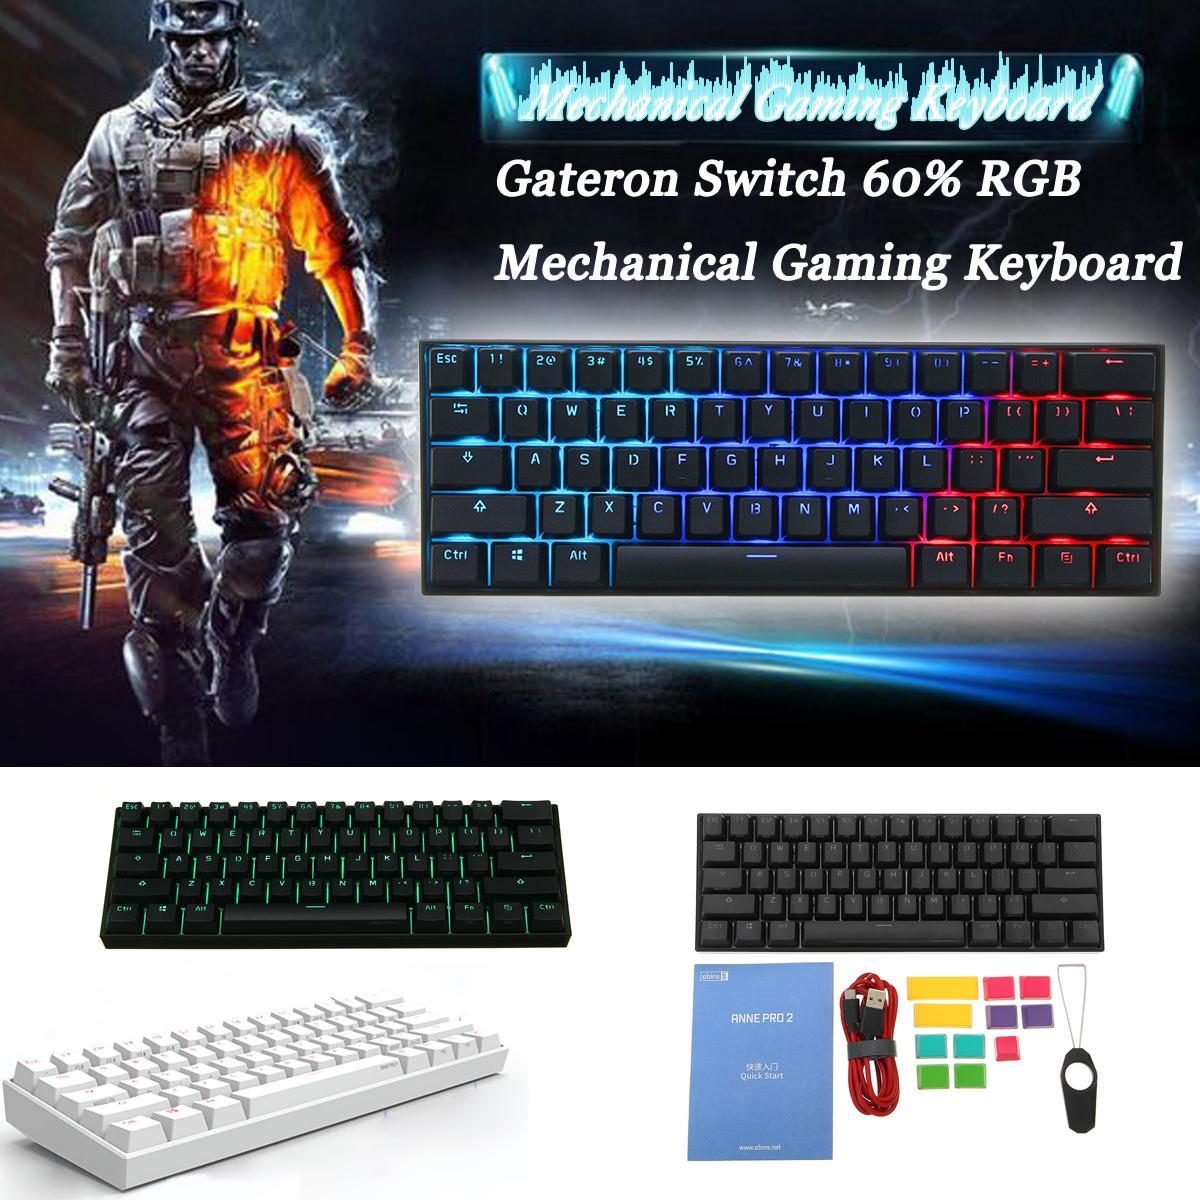 Obins ANNE PRO 2 Gateron Switch NKRO bluetooth4.0 RGB Mechanical Gaming Keyboard